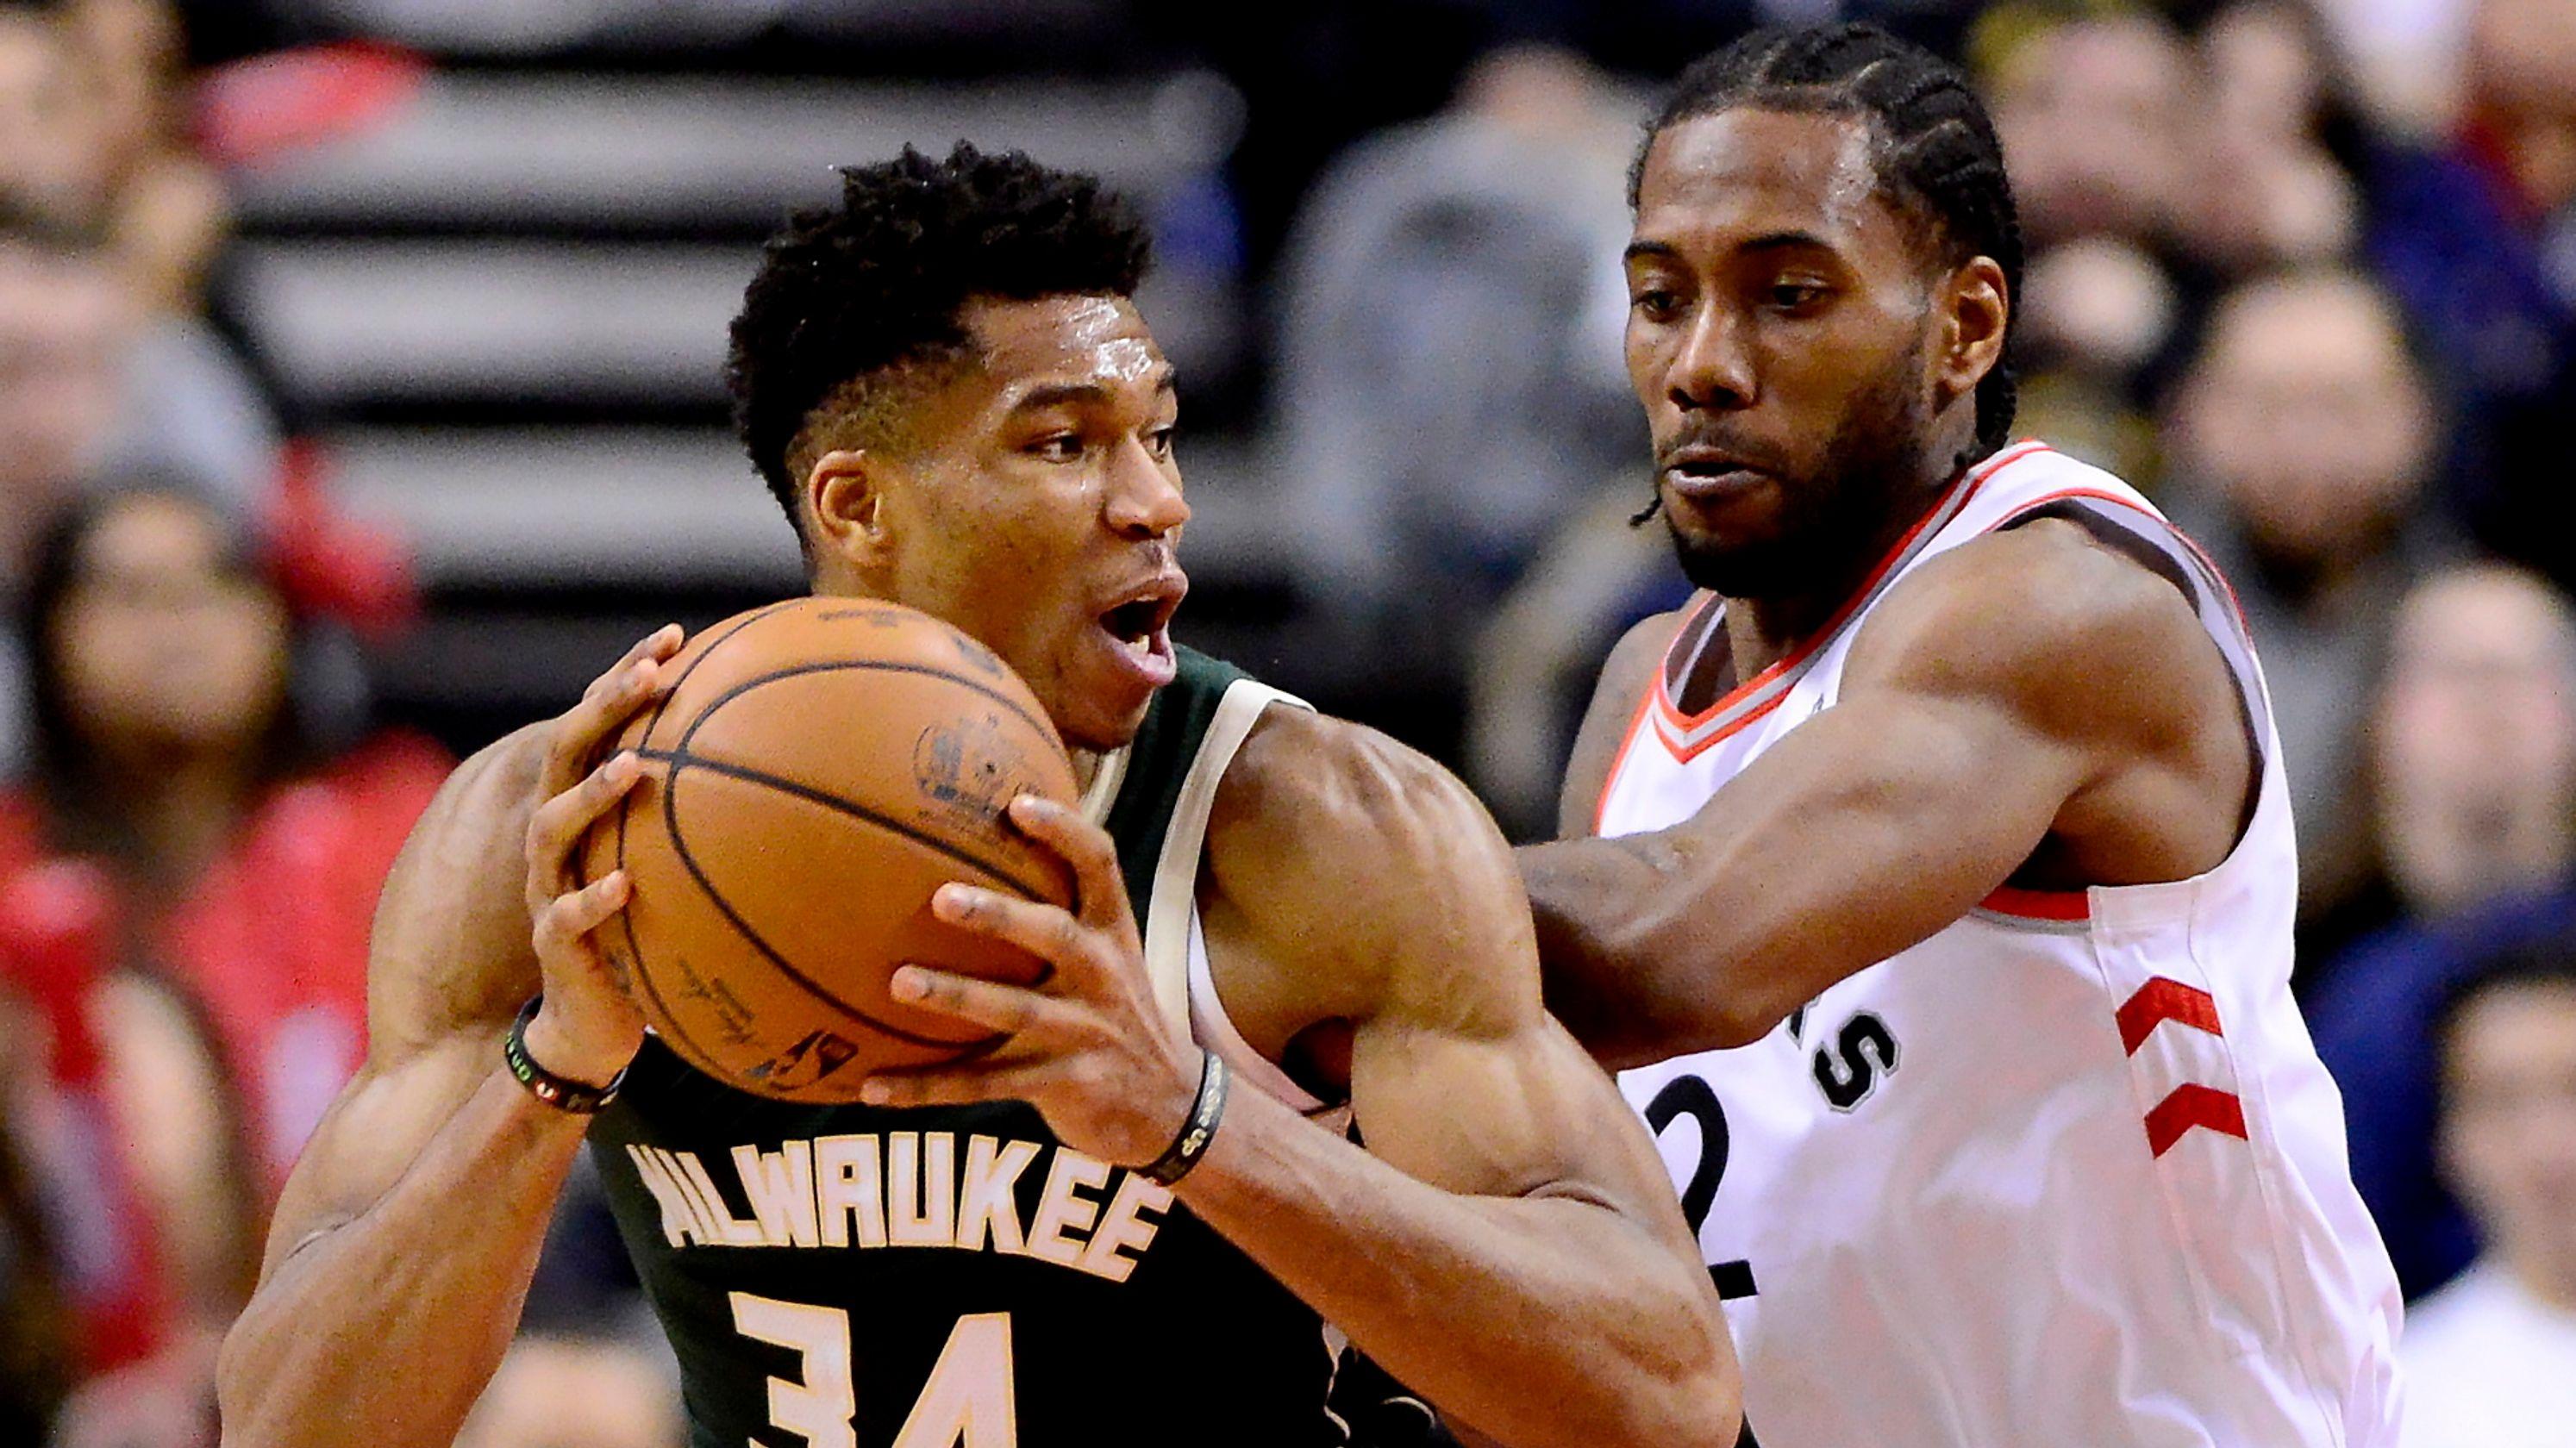 Bucks hold off Raptors in thriller between Eastern Conference heavyweights